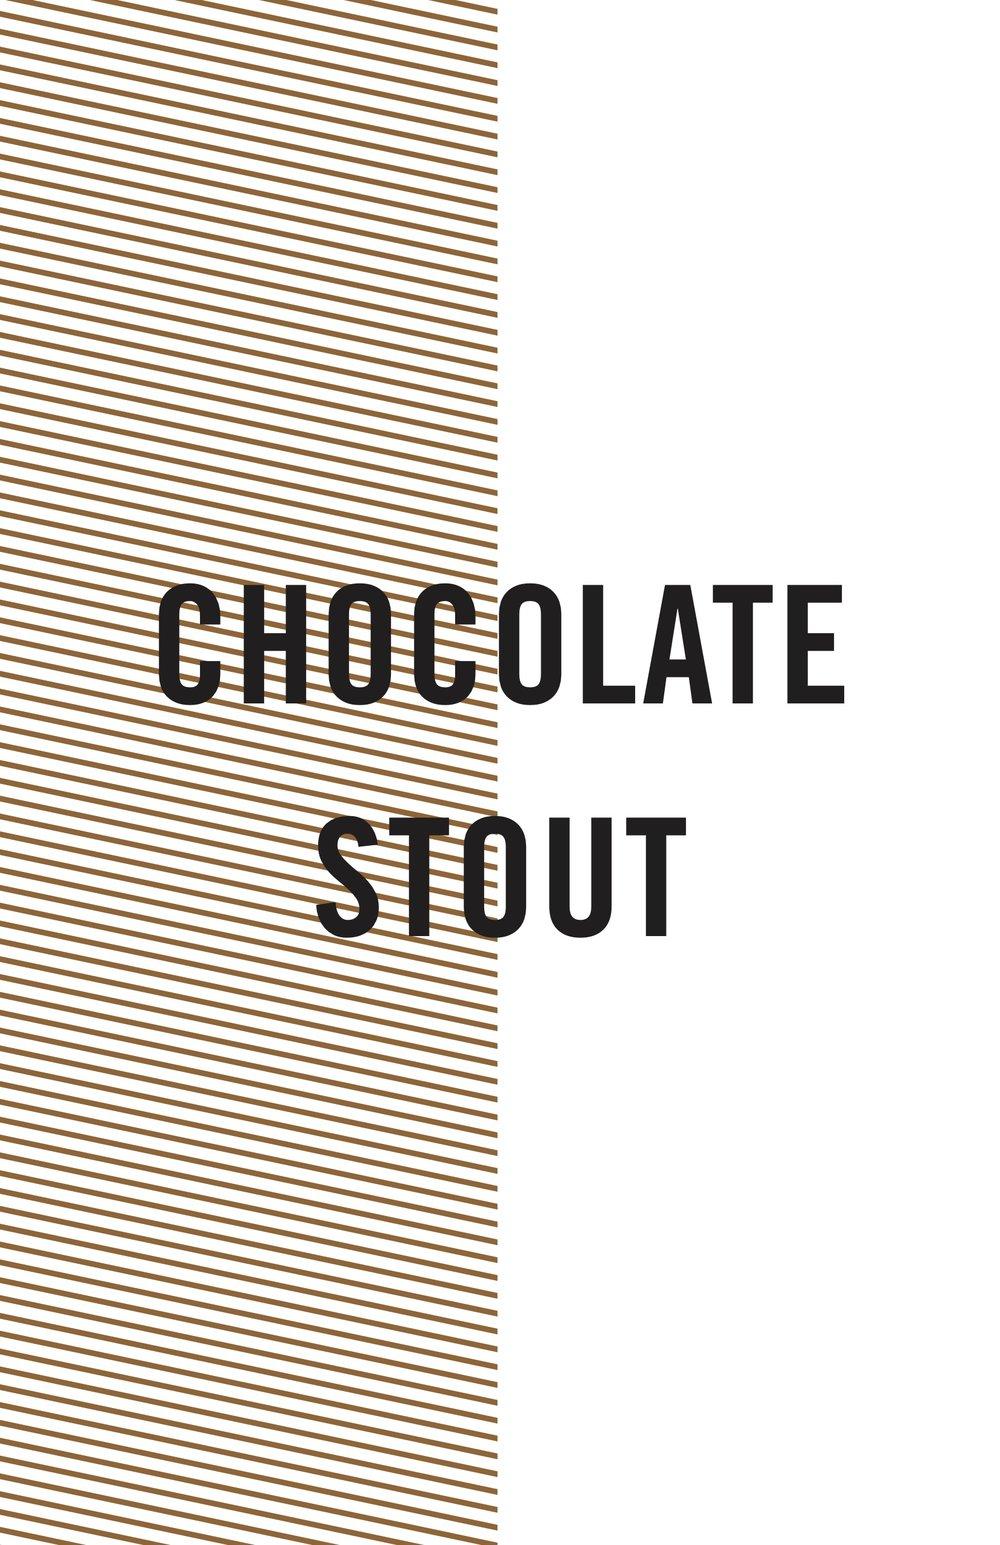 CHOCOLATE STOUT.jpg